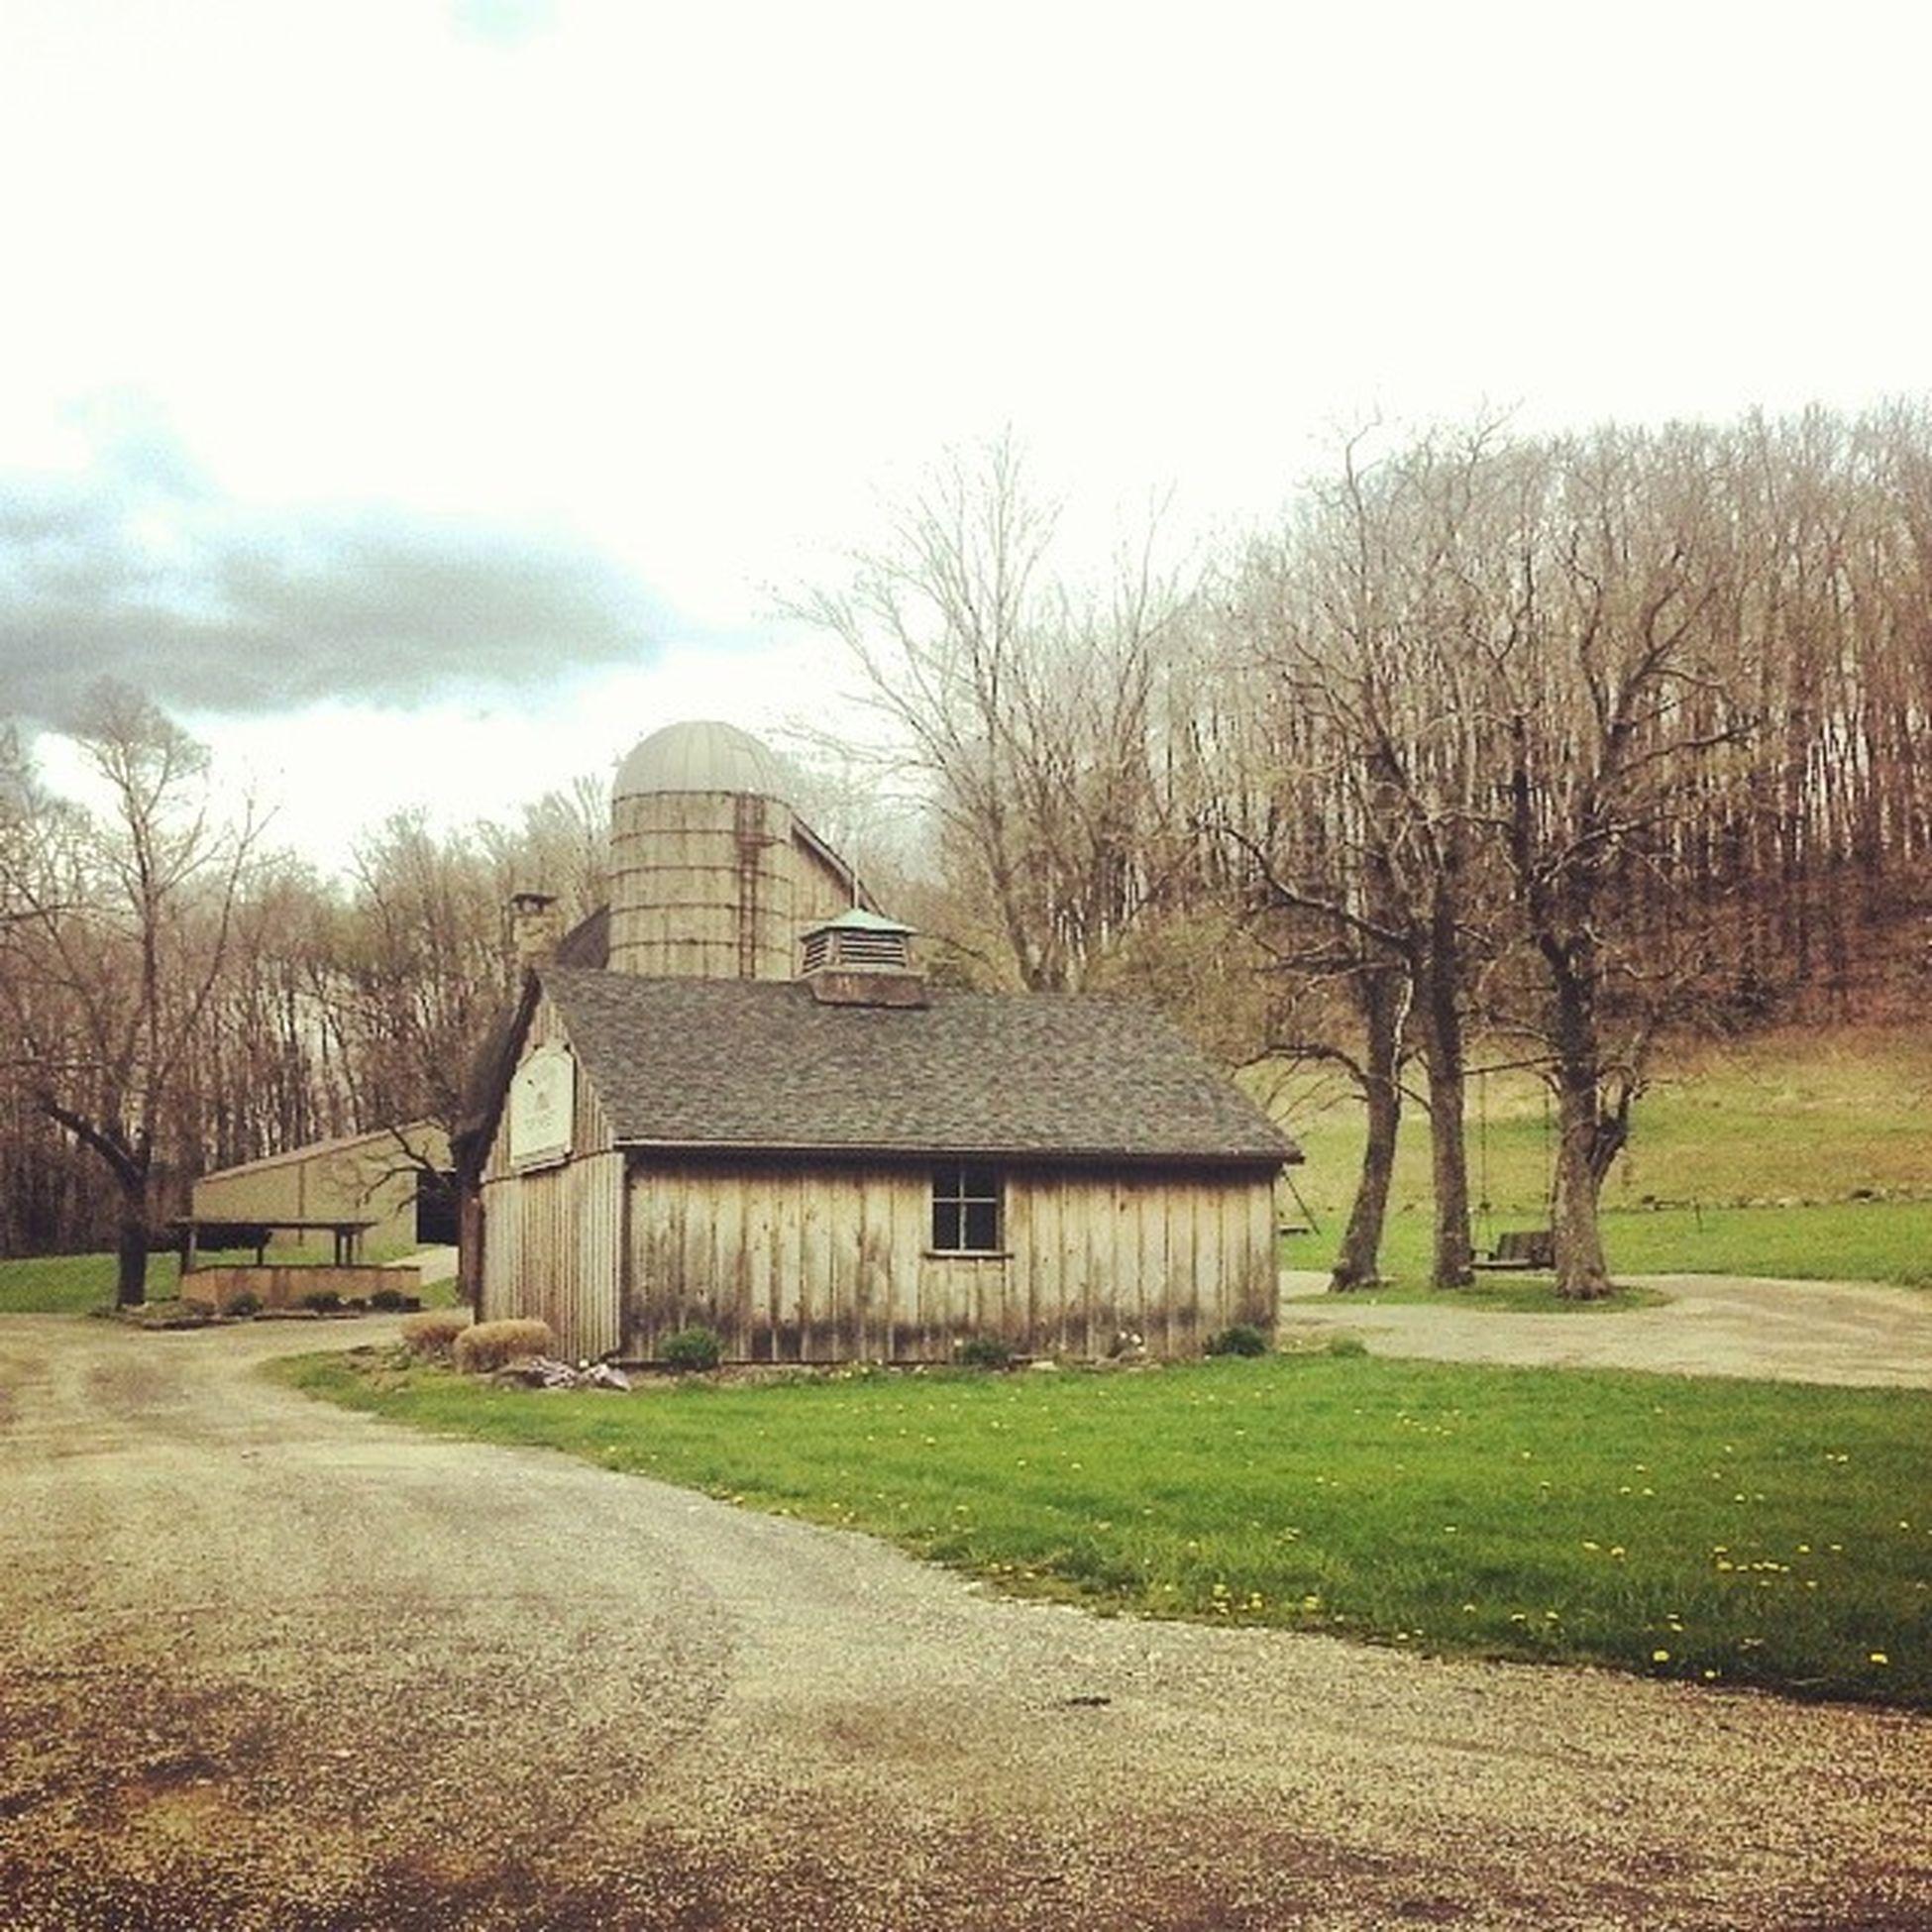 On a random Sunday drive I came across some really pretty scenes. SnodesRestoredCountryBarn Restored Country OhioBarns Barn Weddingvenue